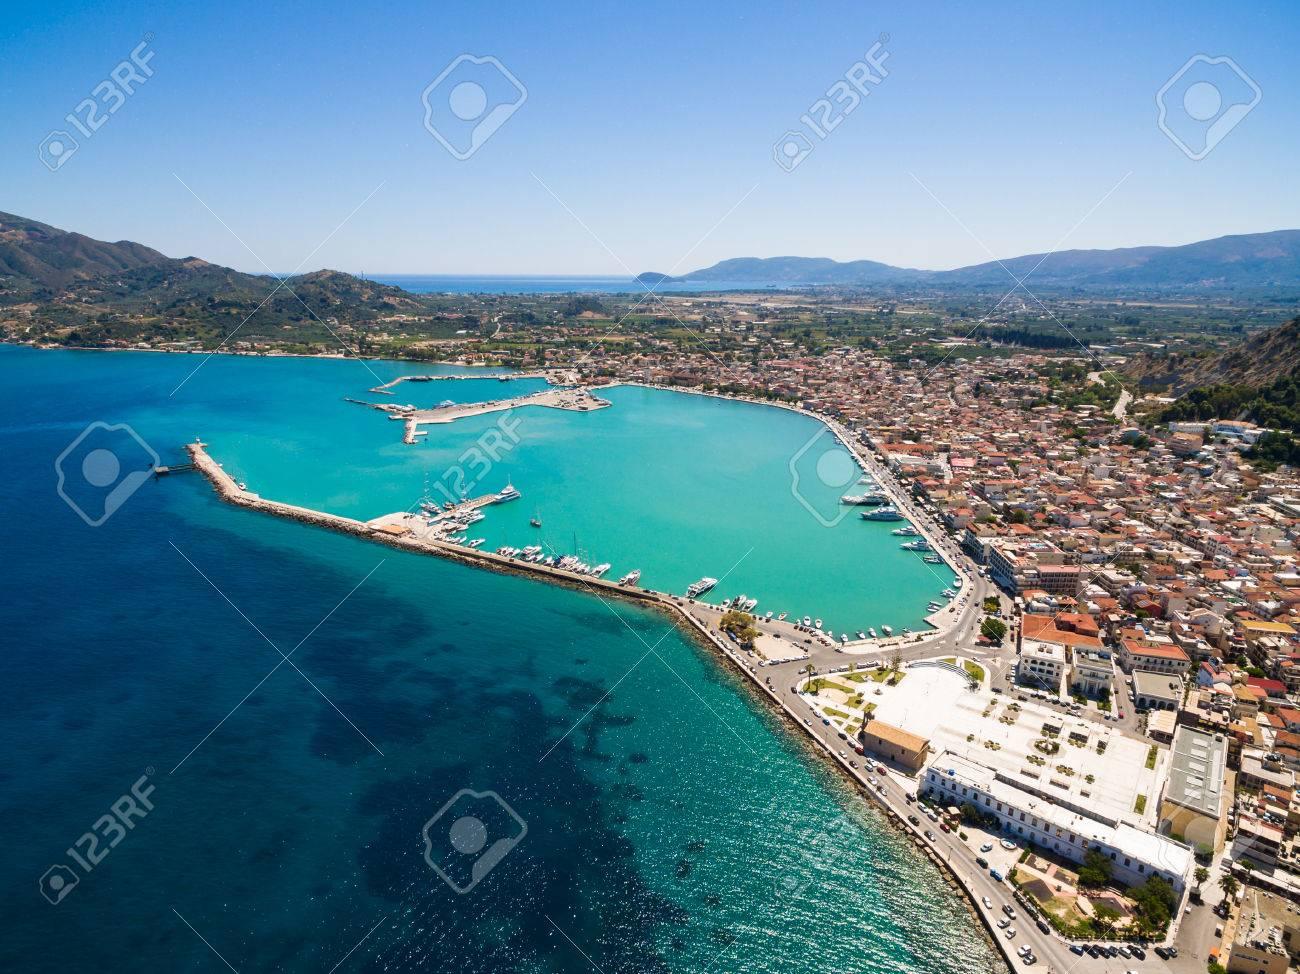 Aerial view of Zakynthos city in Zante island, in Greece - 84343672